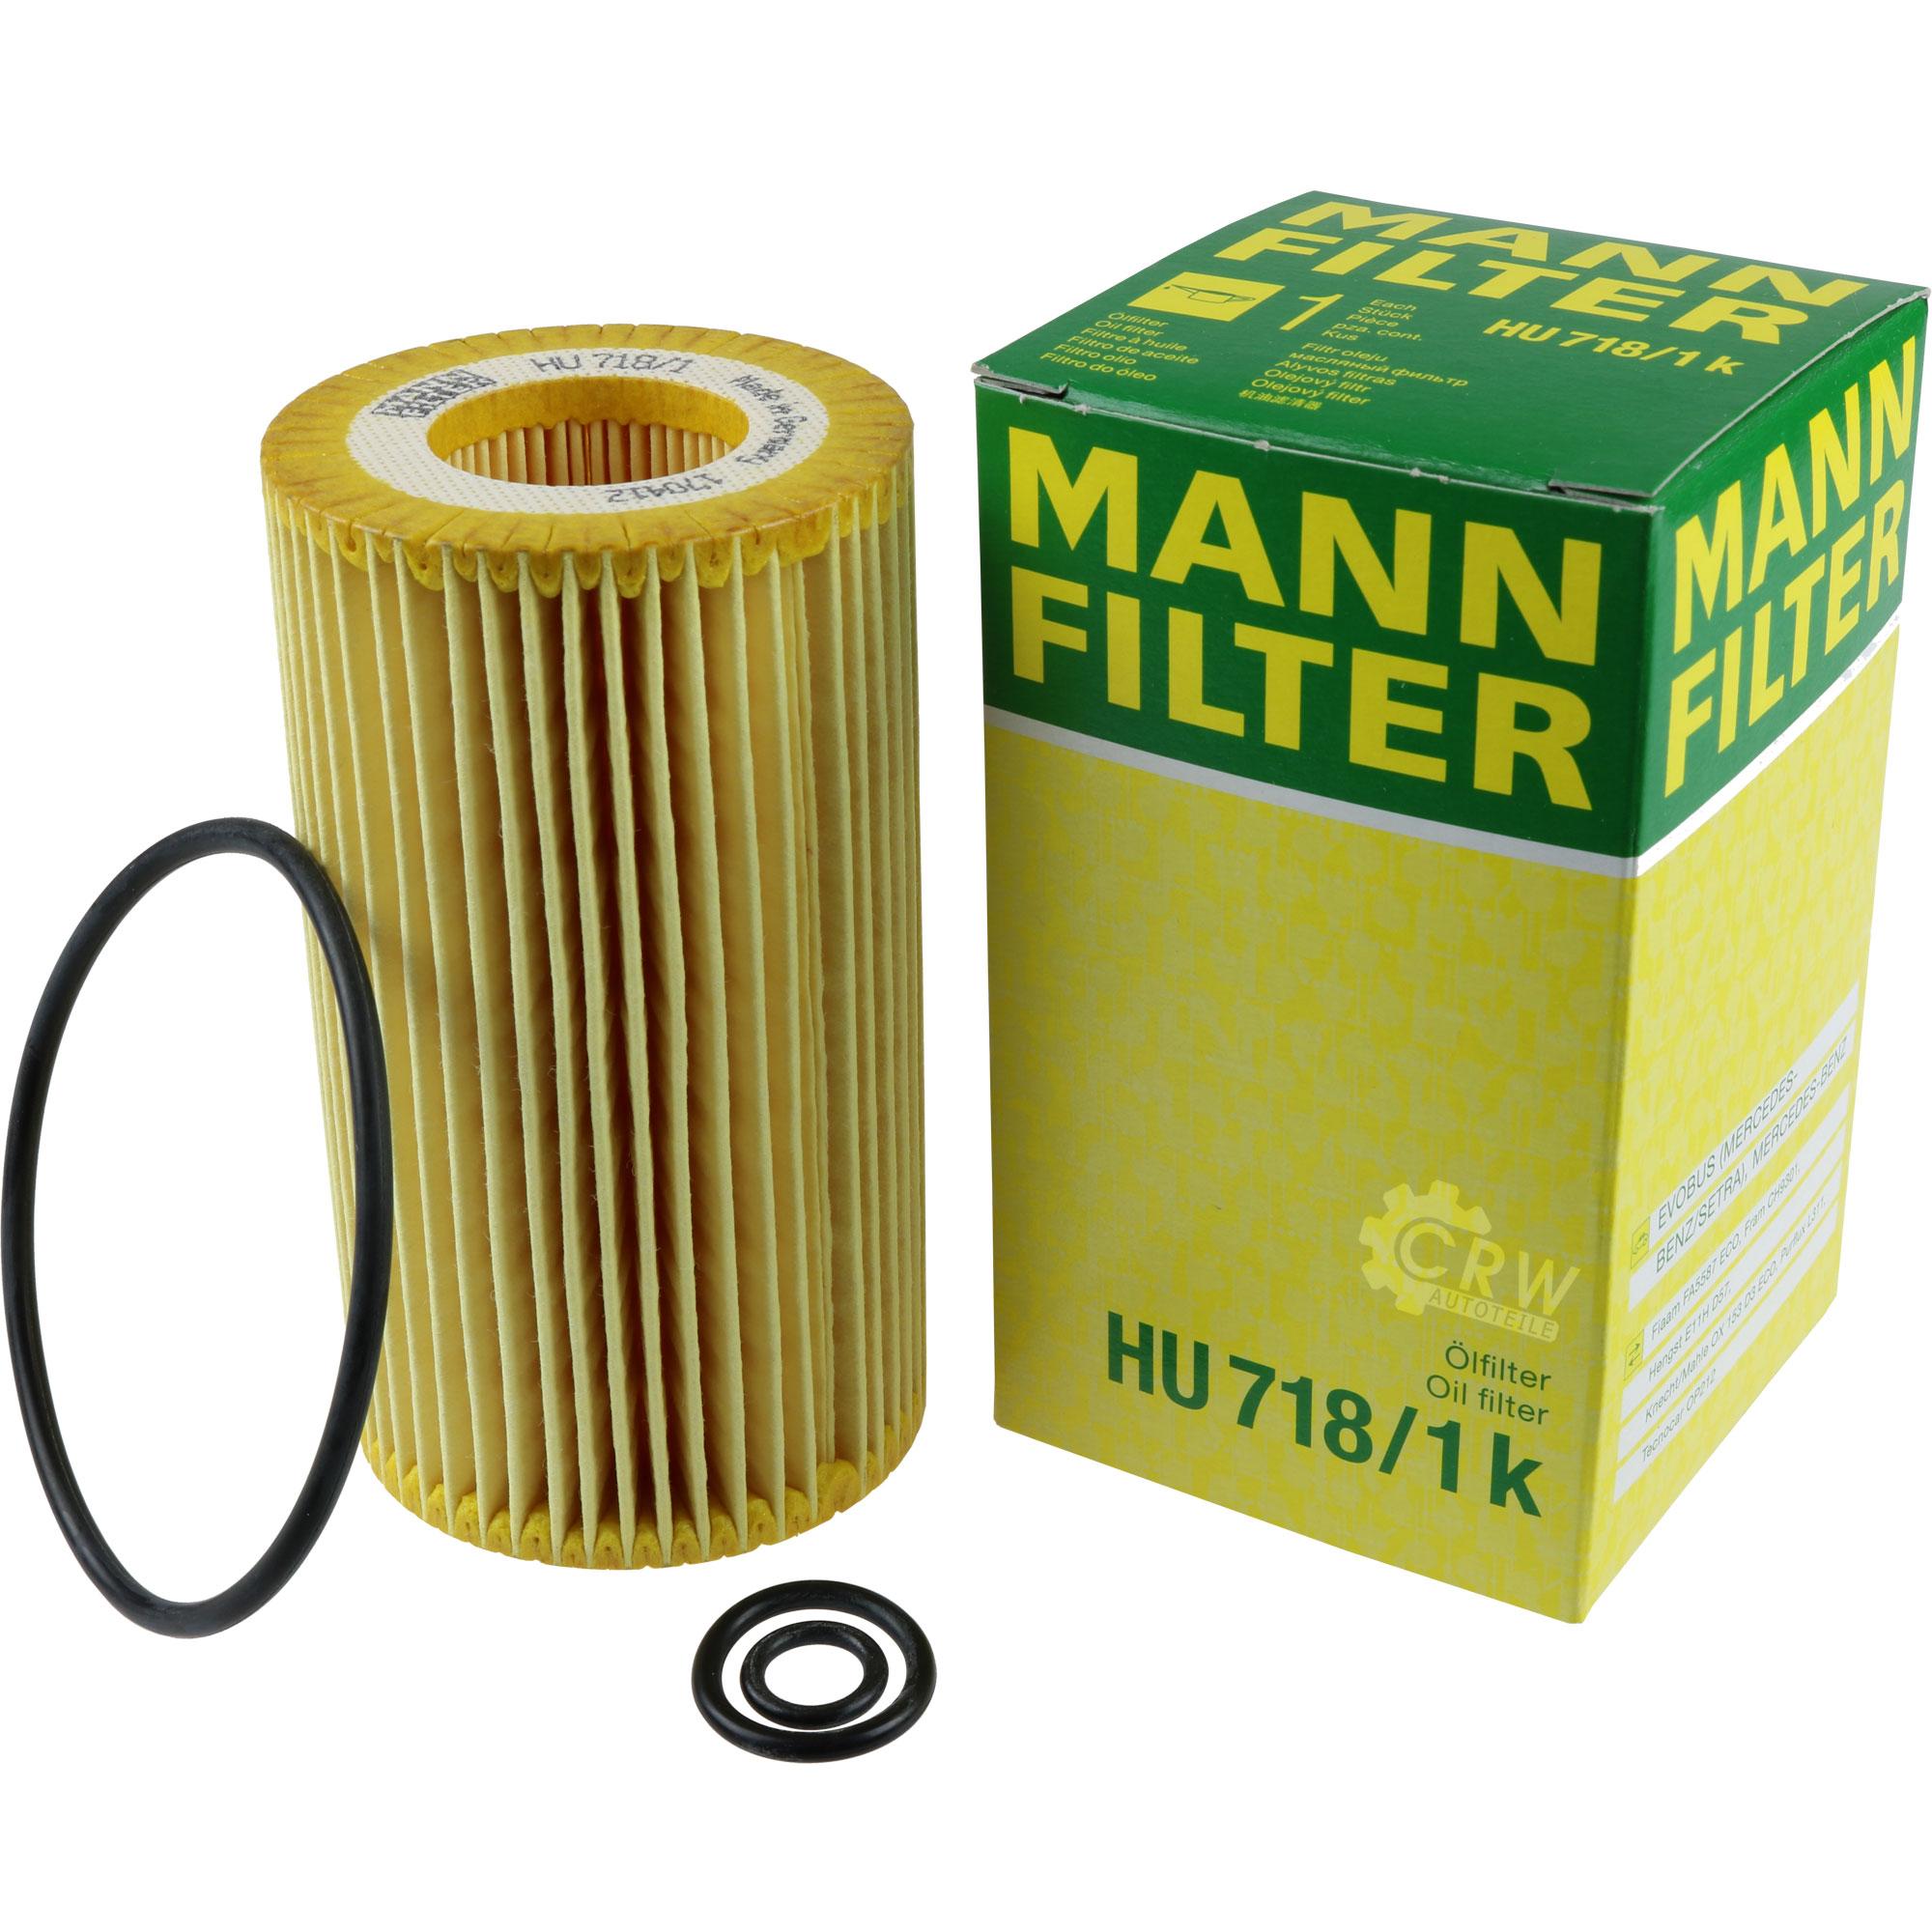 Motor-Ol-6L-MANNOL-Classic-10W-40-MANN-FILTER-Mercedes-Benz-C-Klasse-W202 Indexbild 10